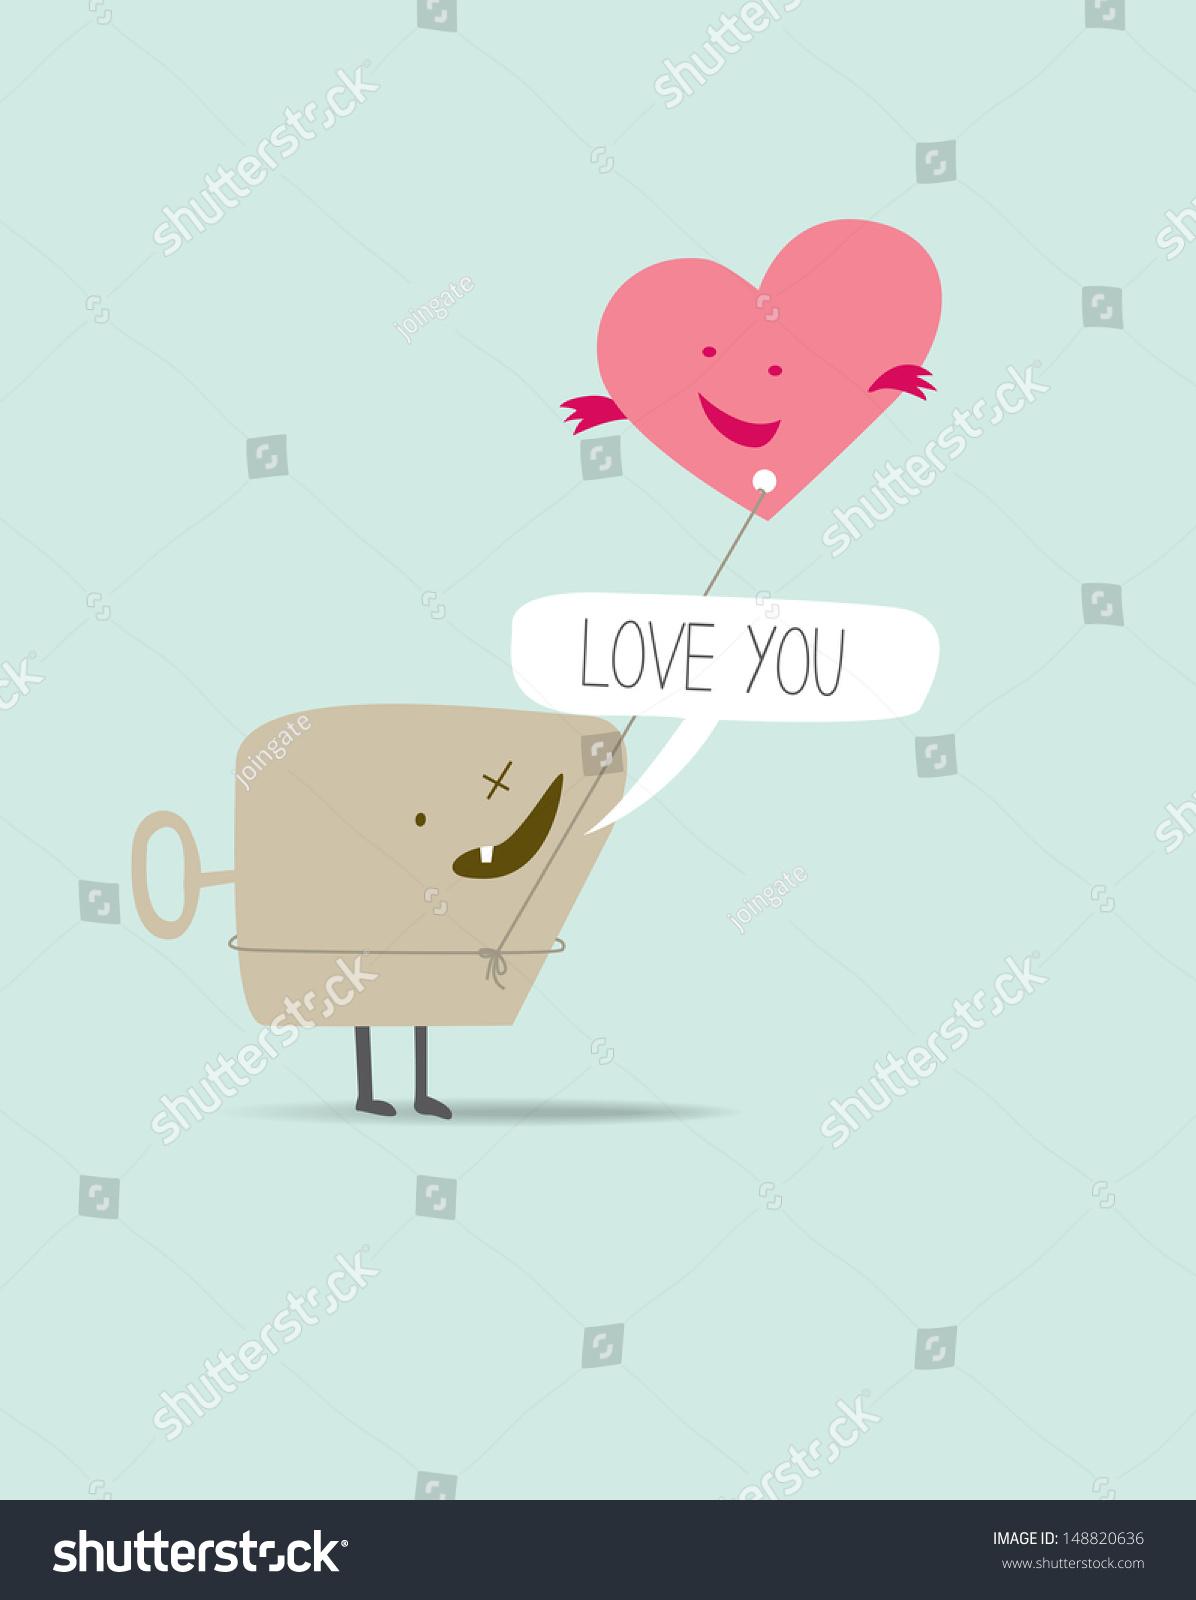 Cute Cartoon Characters In Love